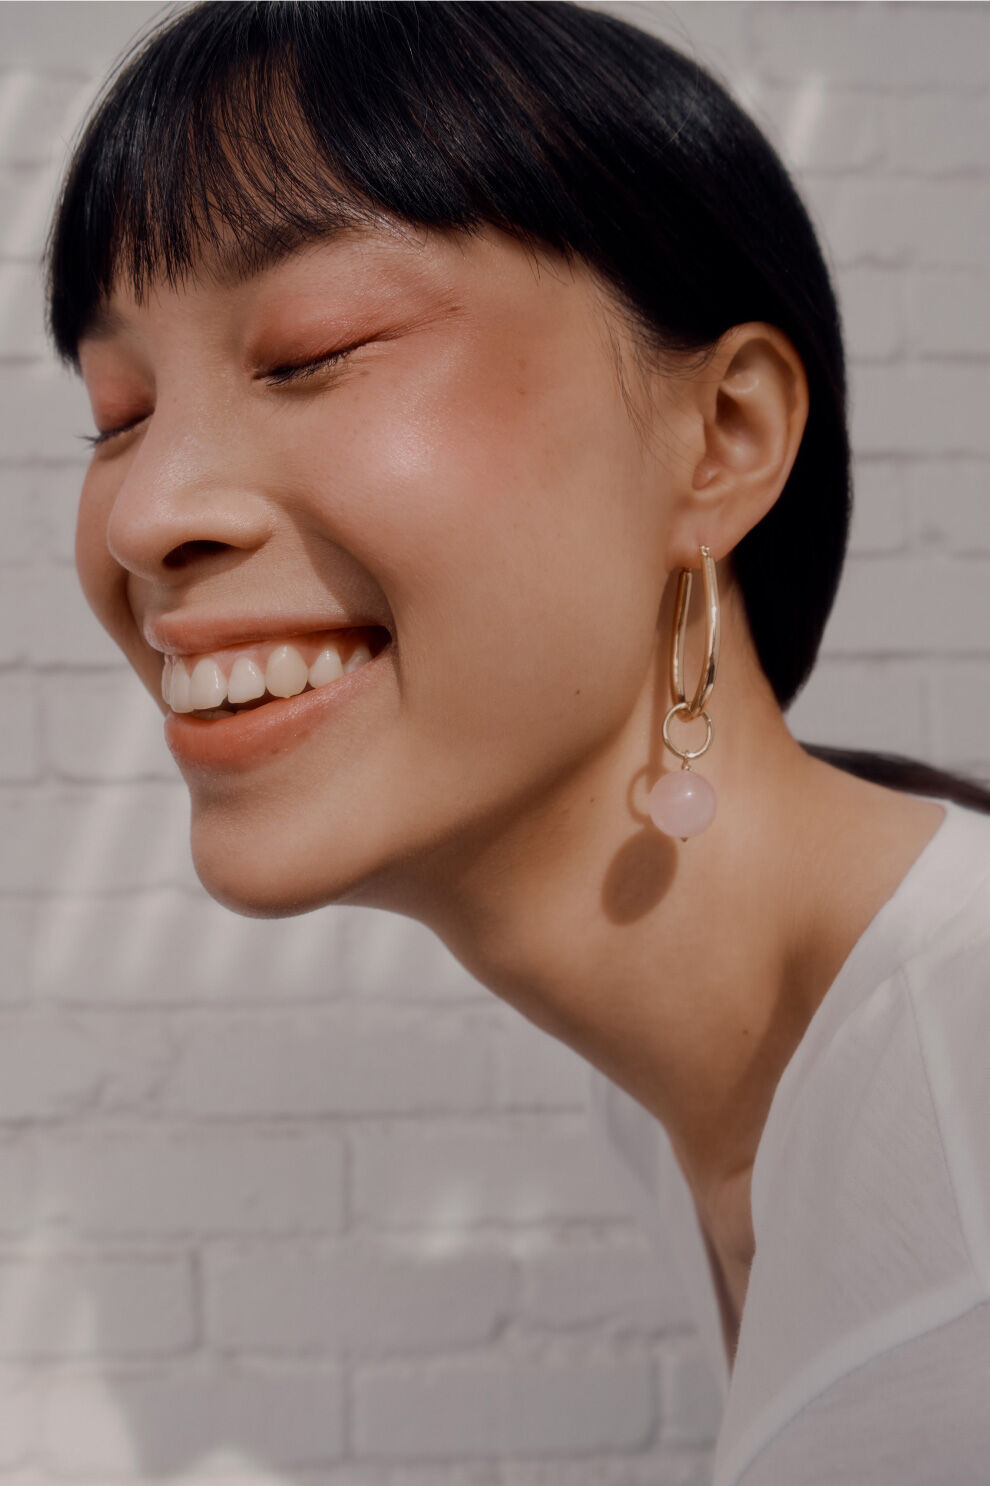 Model wearing Petal Hoop Earring with Rose Quartz Embellishment